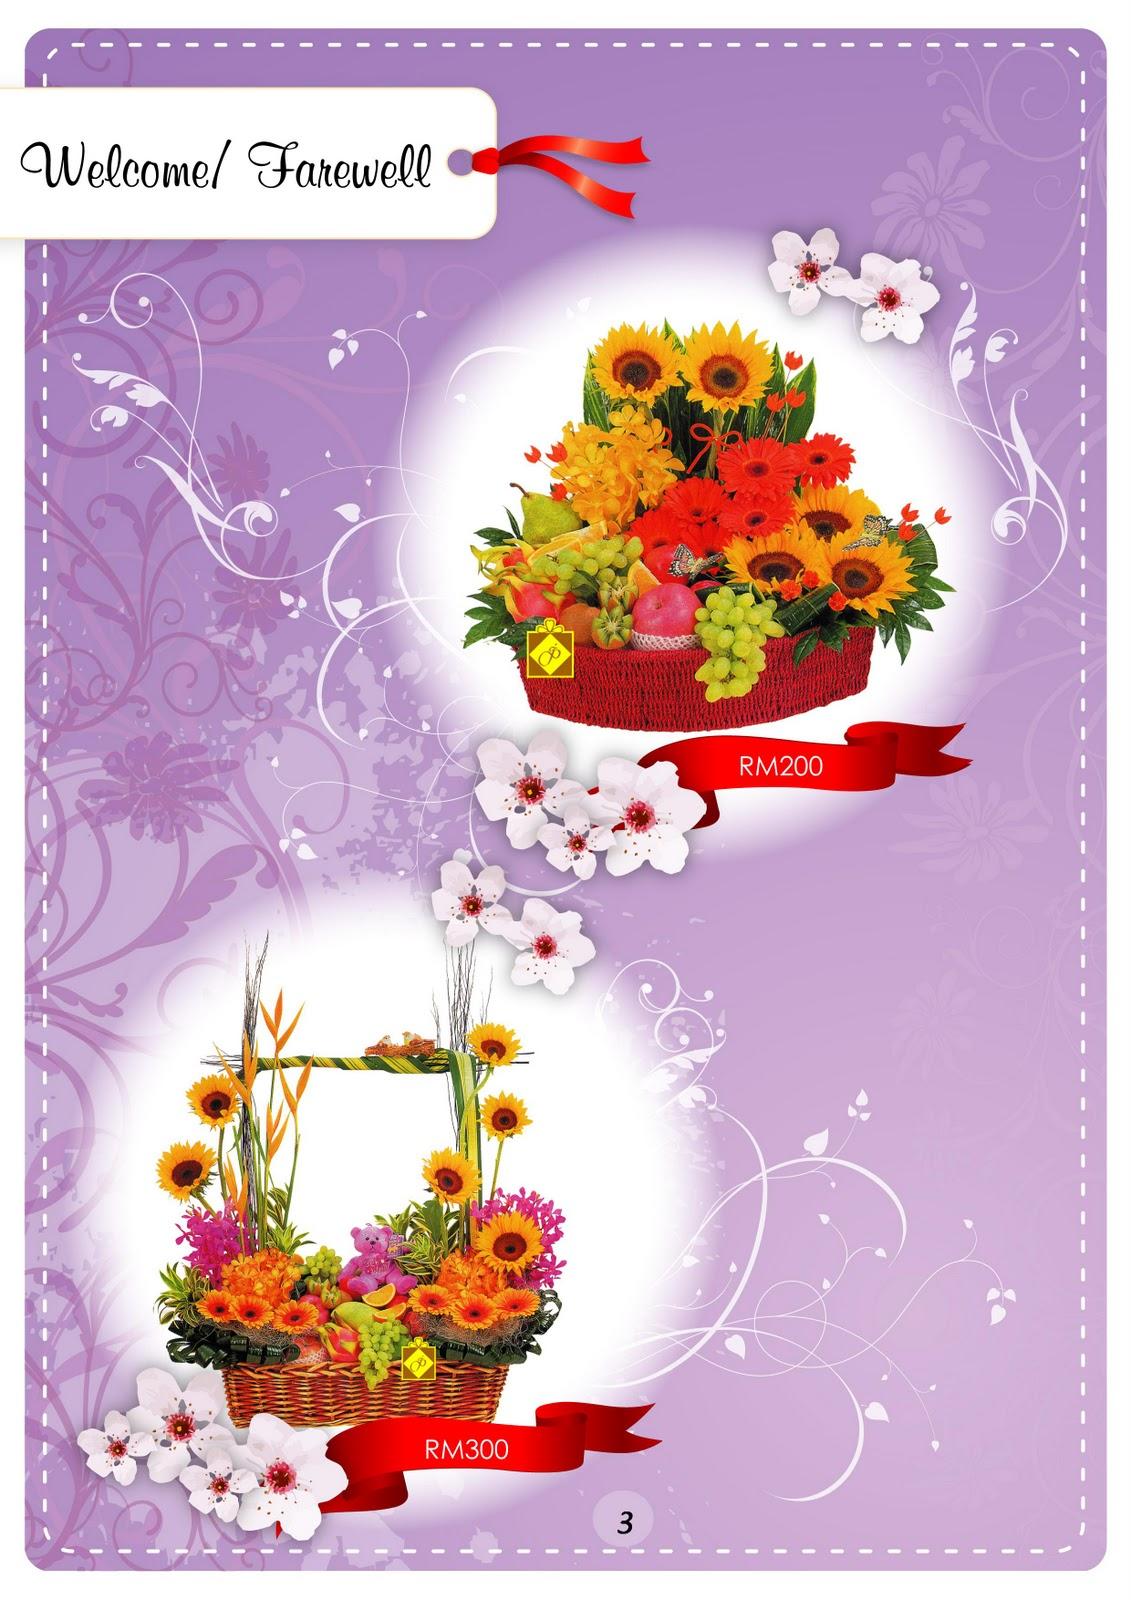 Welcome To Sri Jaya Giftshoppe SRI JAYA FAREWELL FLOWER Amp FRUITS